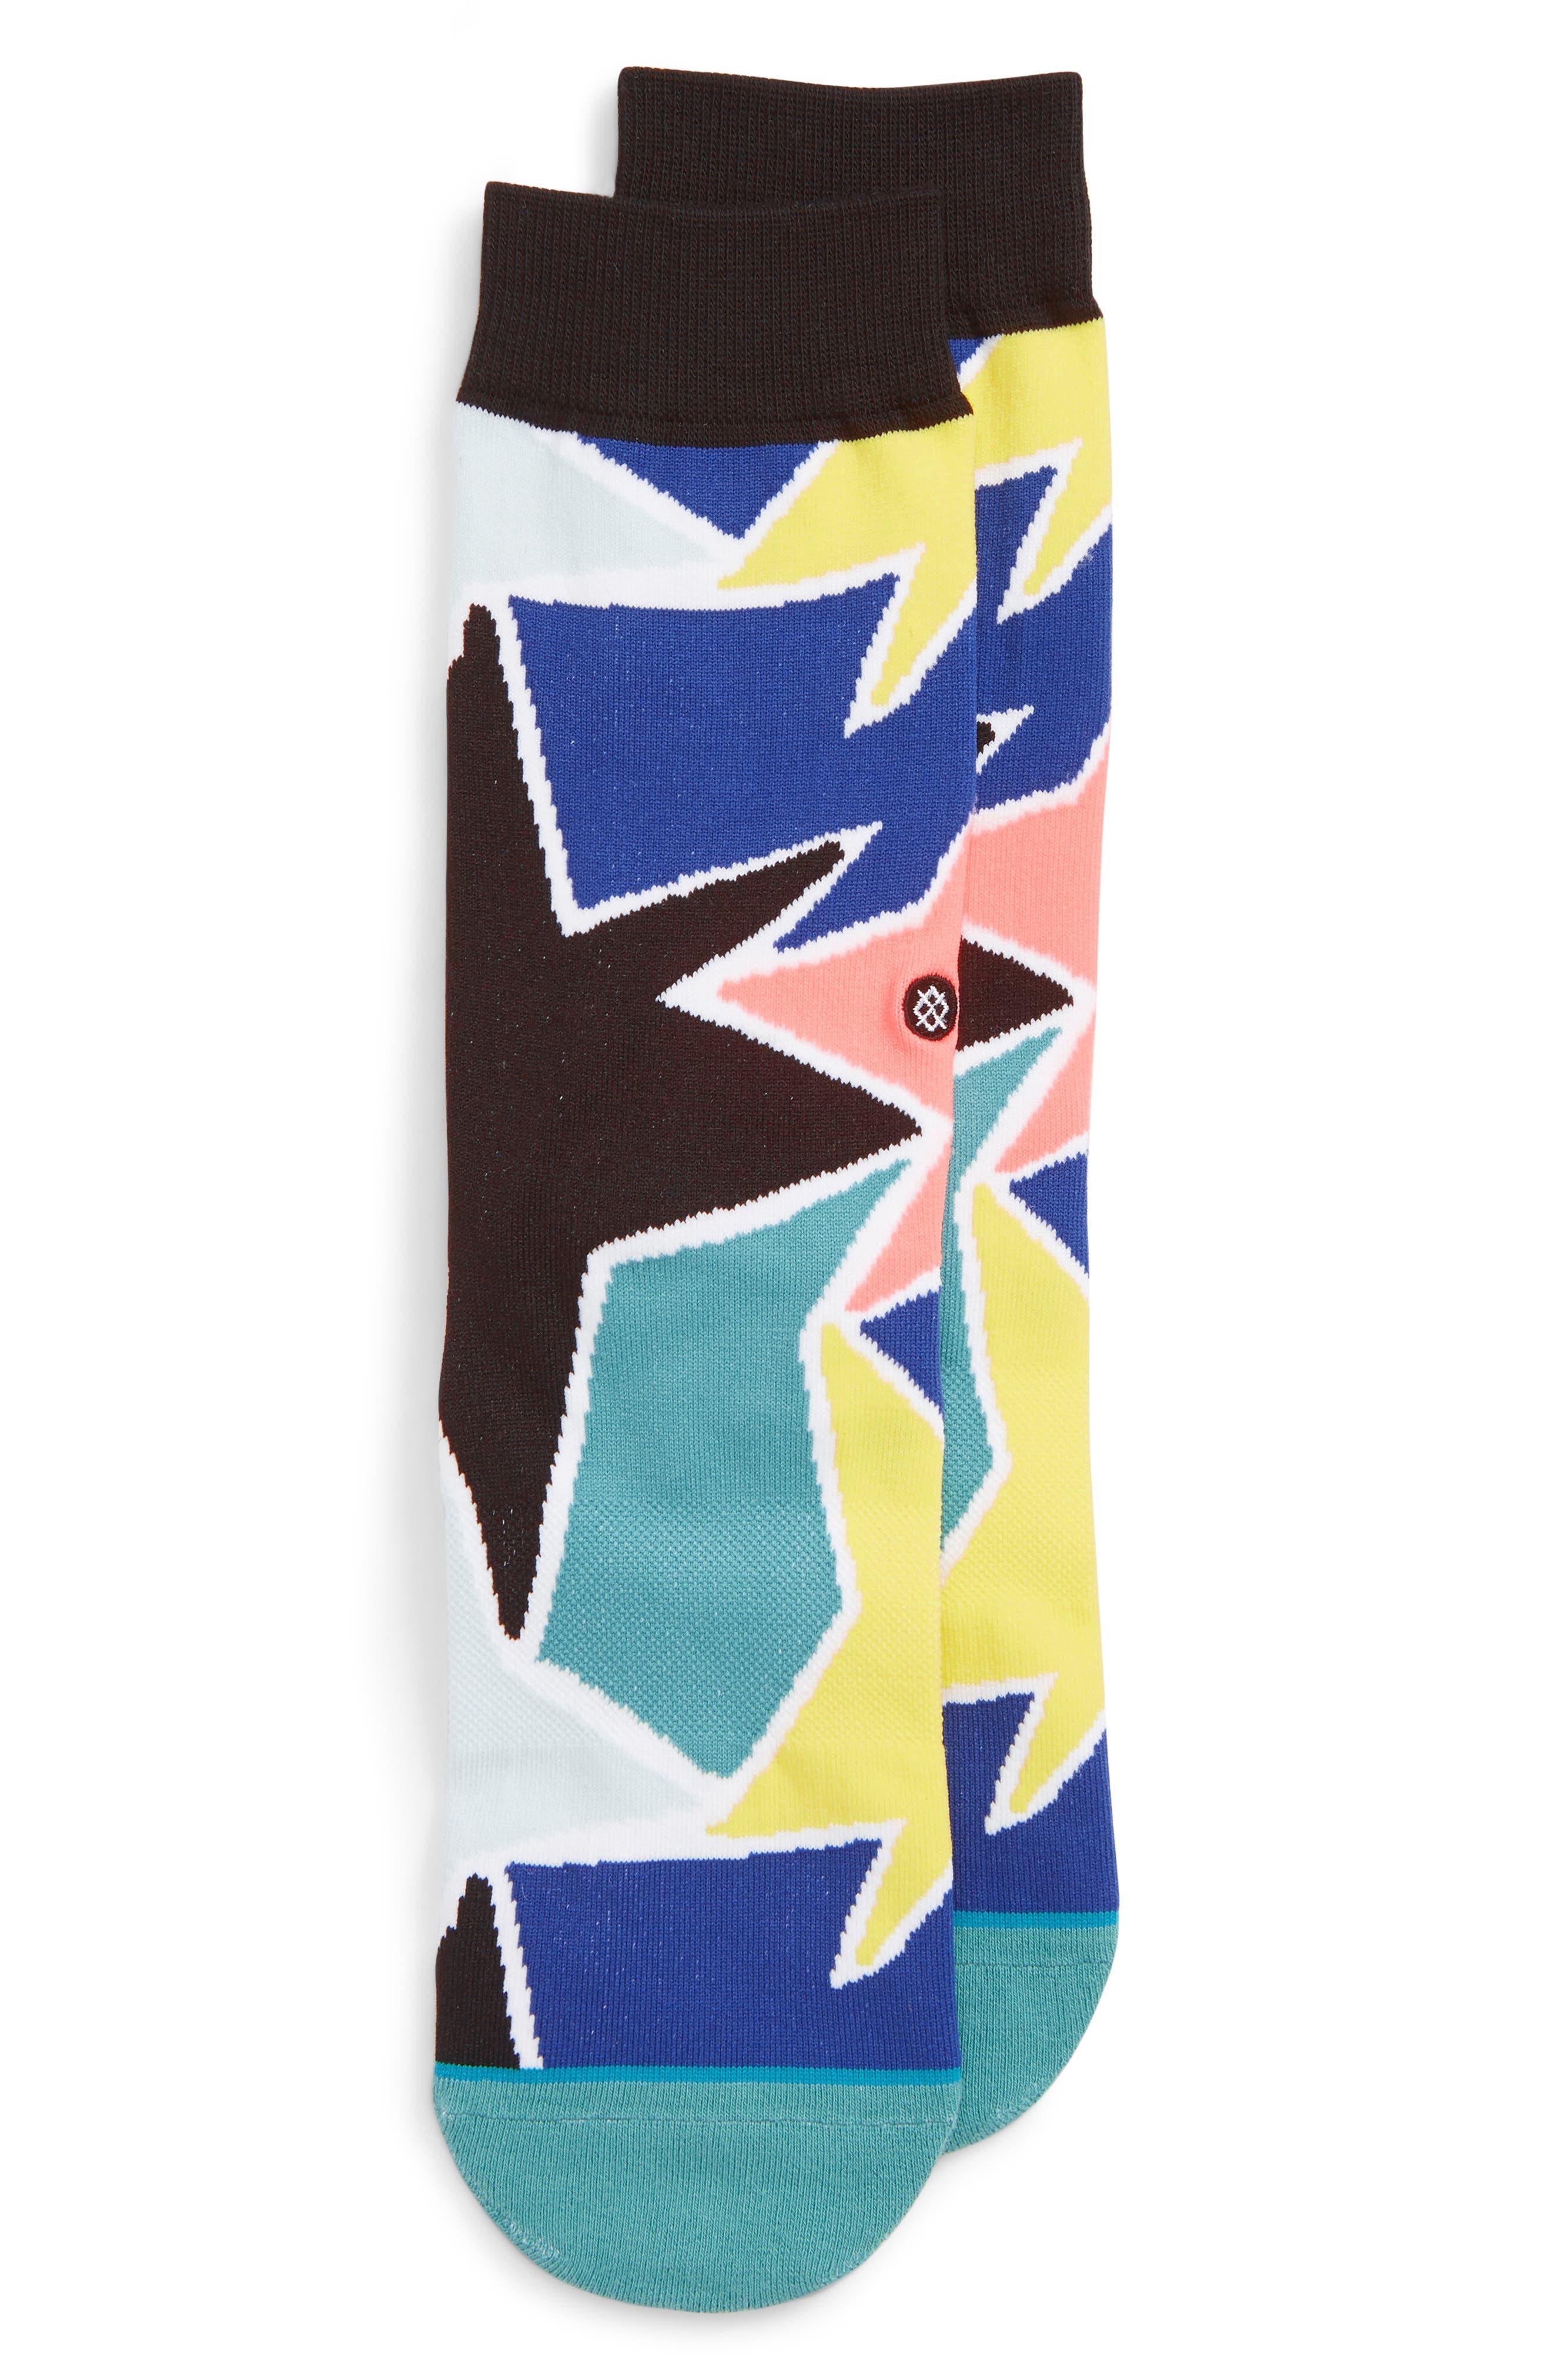 STANCE, Star Struck Crew Socks, Main thumbnail 1, color, BLUE